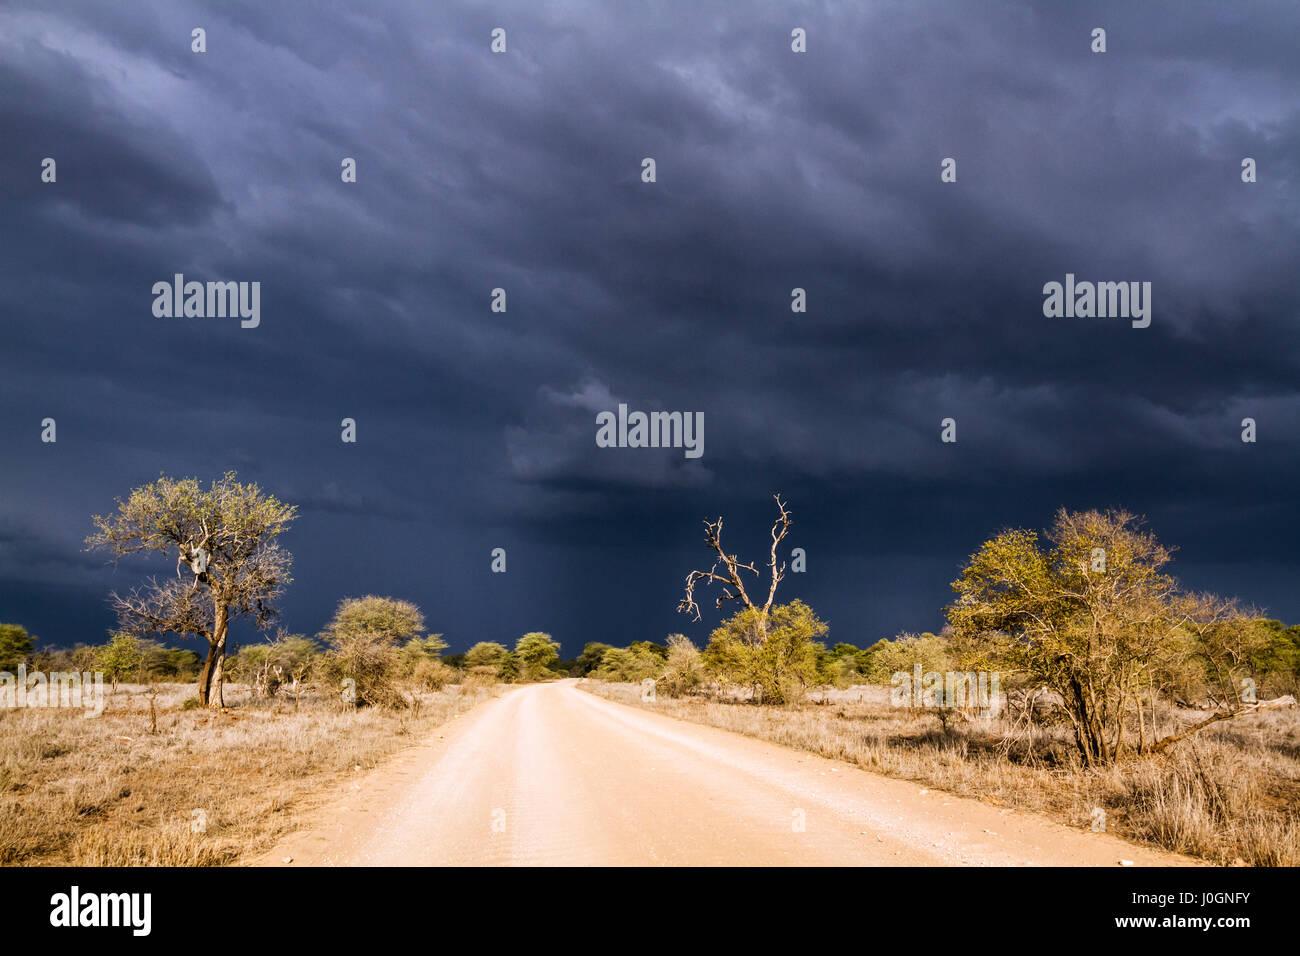 Safari gravel road  in Kruger national park, South Africa - Stock Image